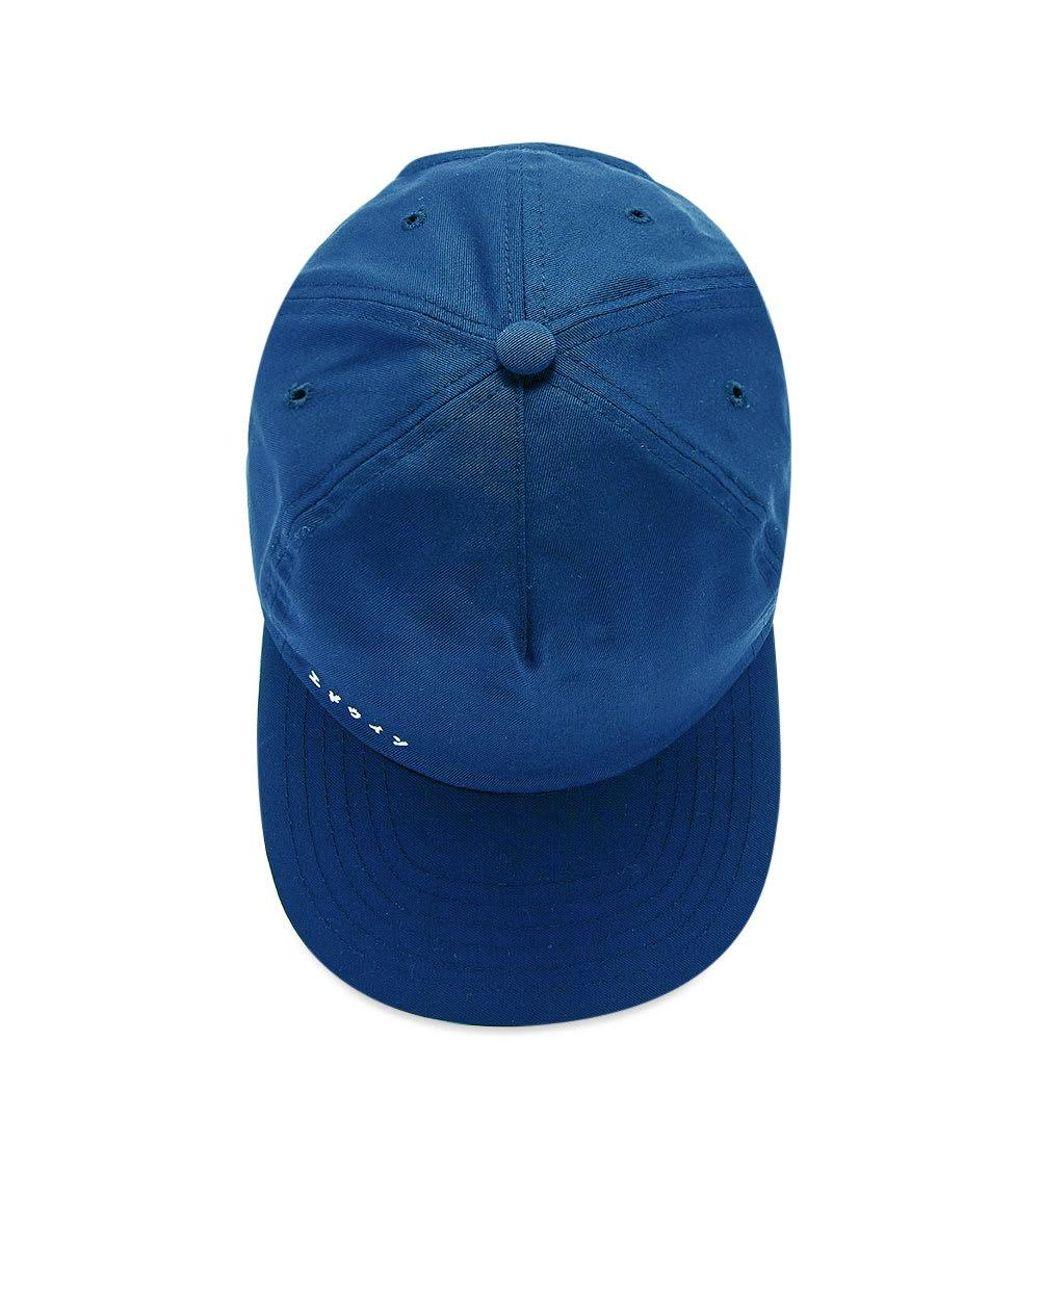 huge discount c8792 2f8d0 Edwin Son Of A Beach Cap in Blue for Men - Lyst